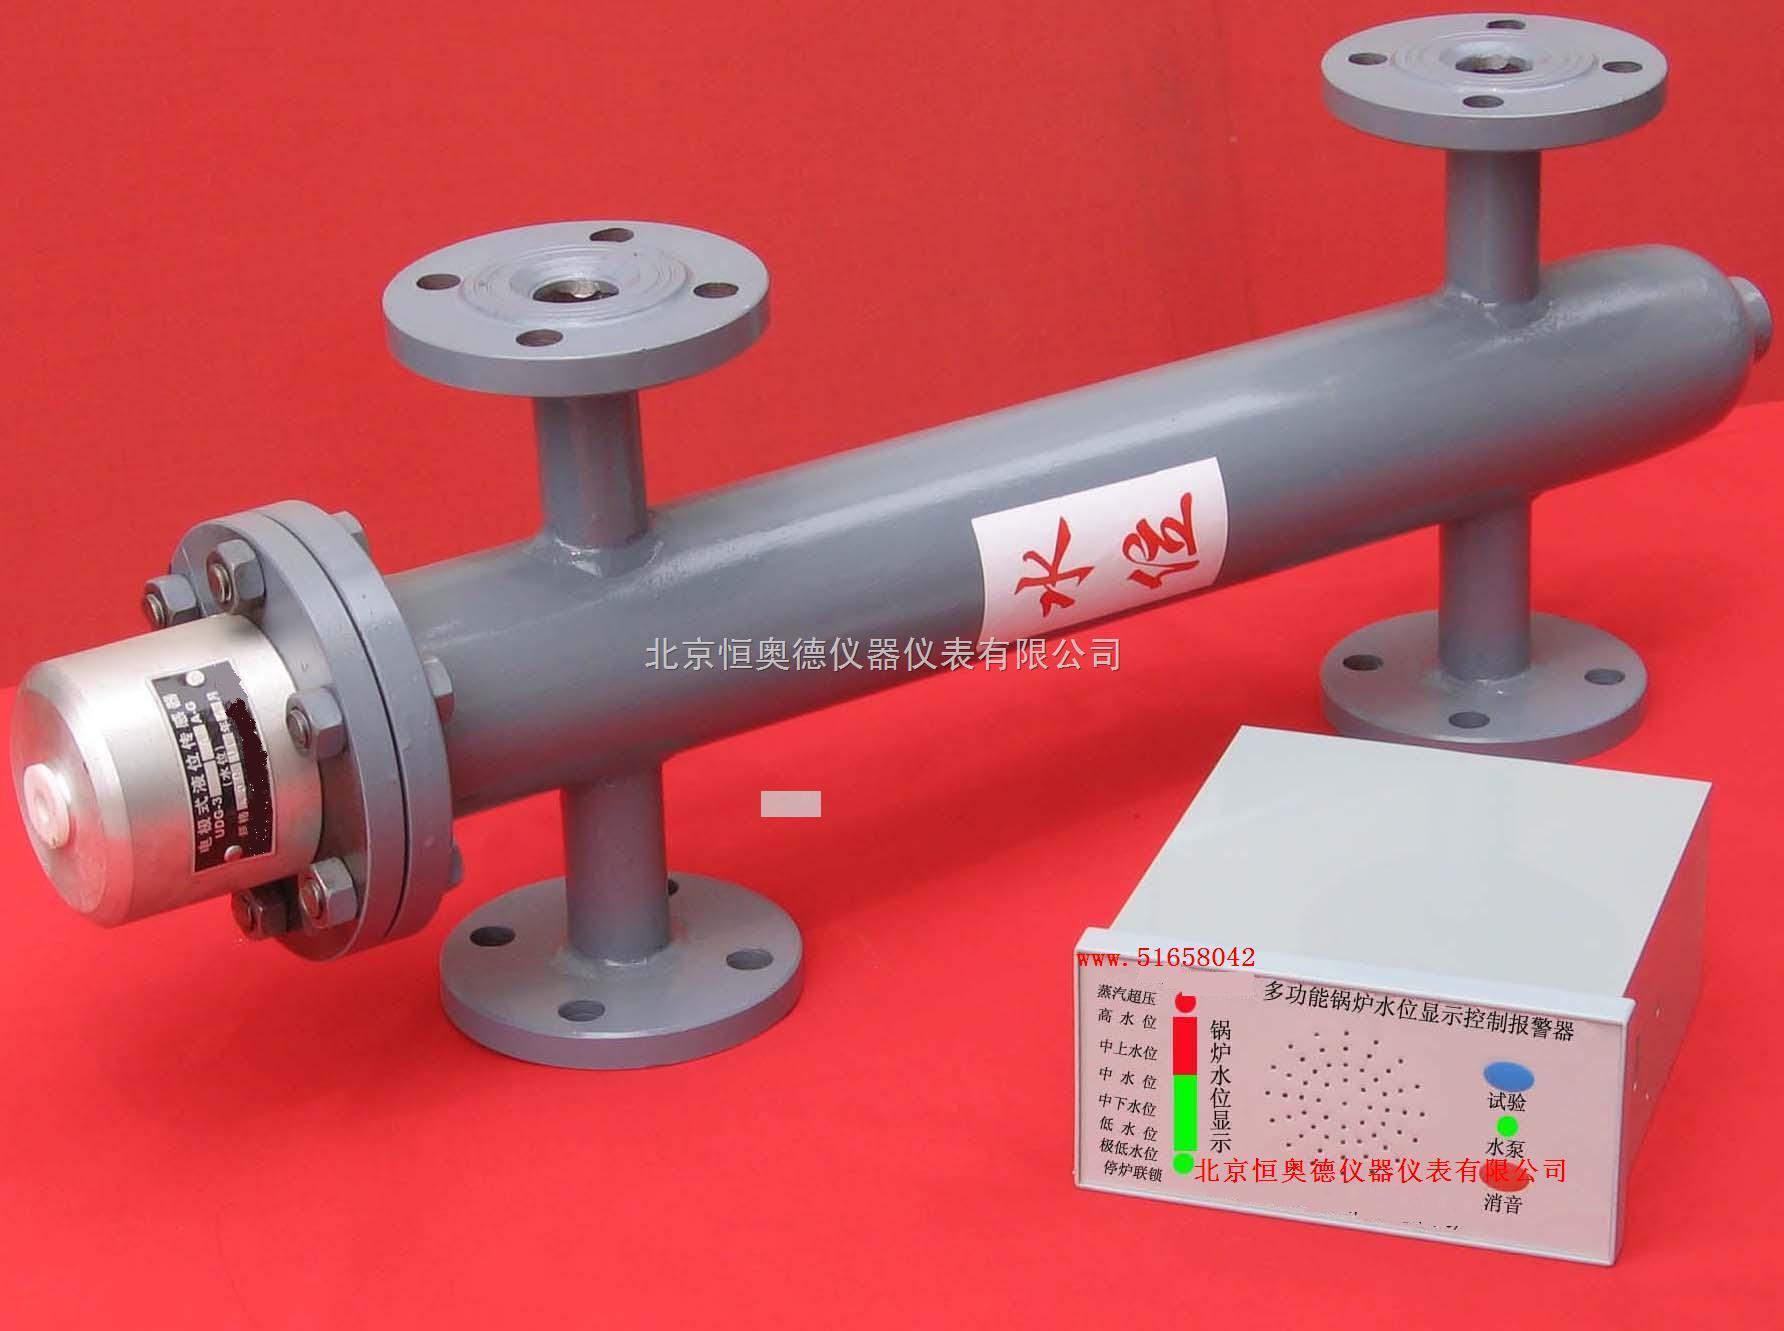 h9350-电极式水位检测仪